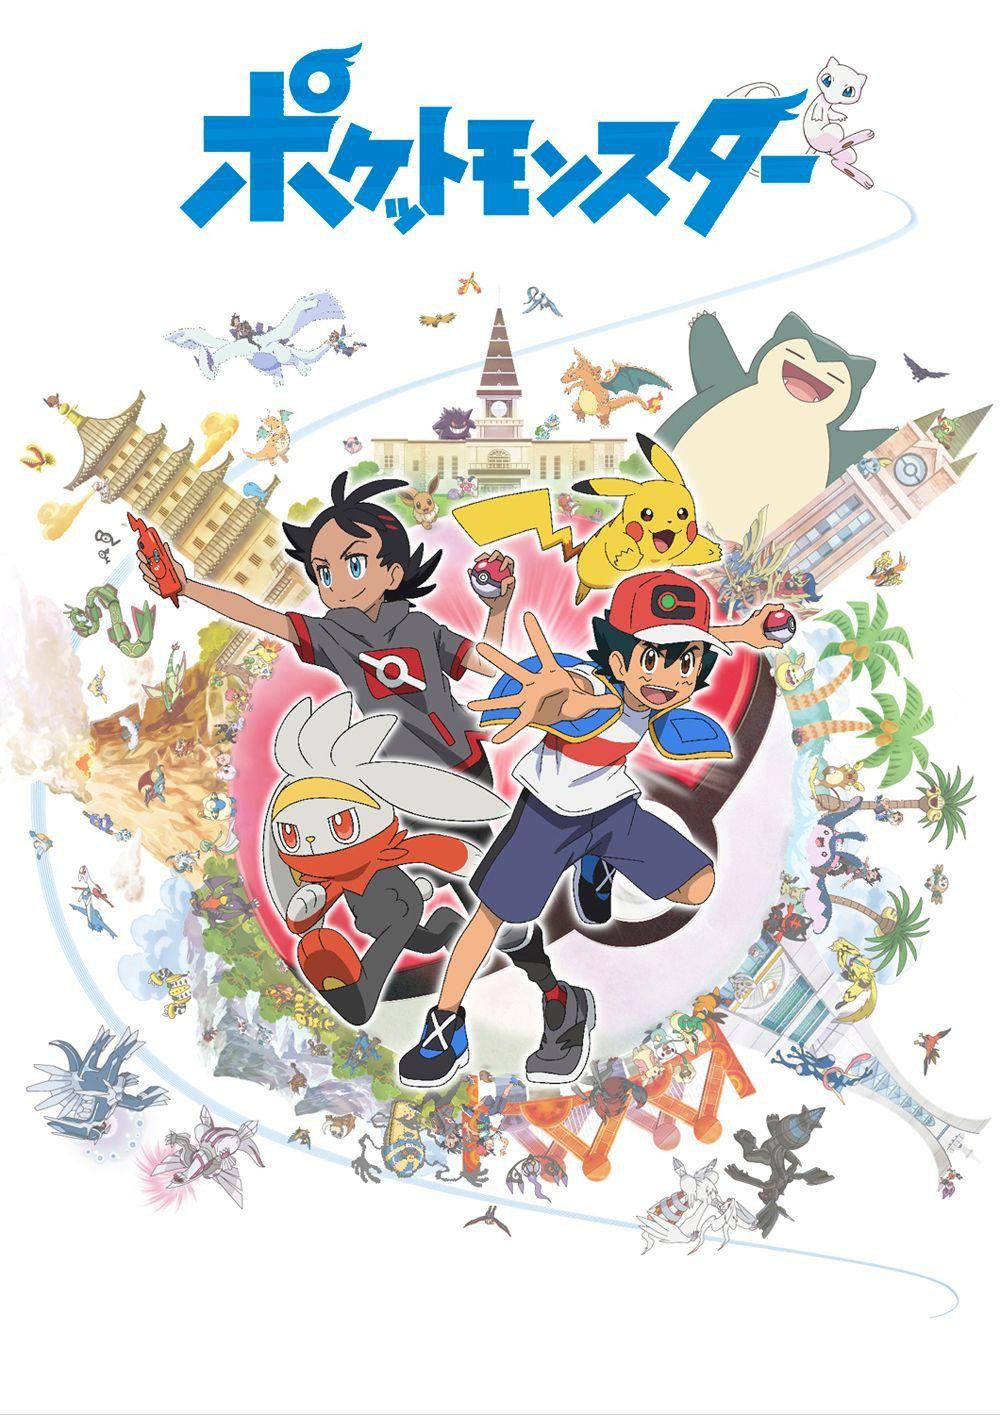 (C) Nintendo・Creatures・GAME FREAK・TV Tokyo・ShoPro・JR Kikaku (C) Pokémon